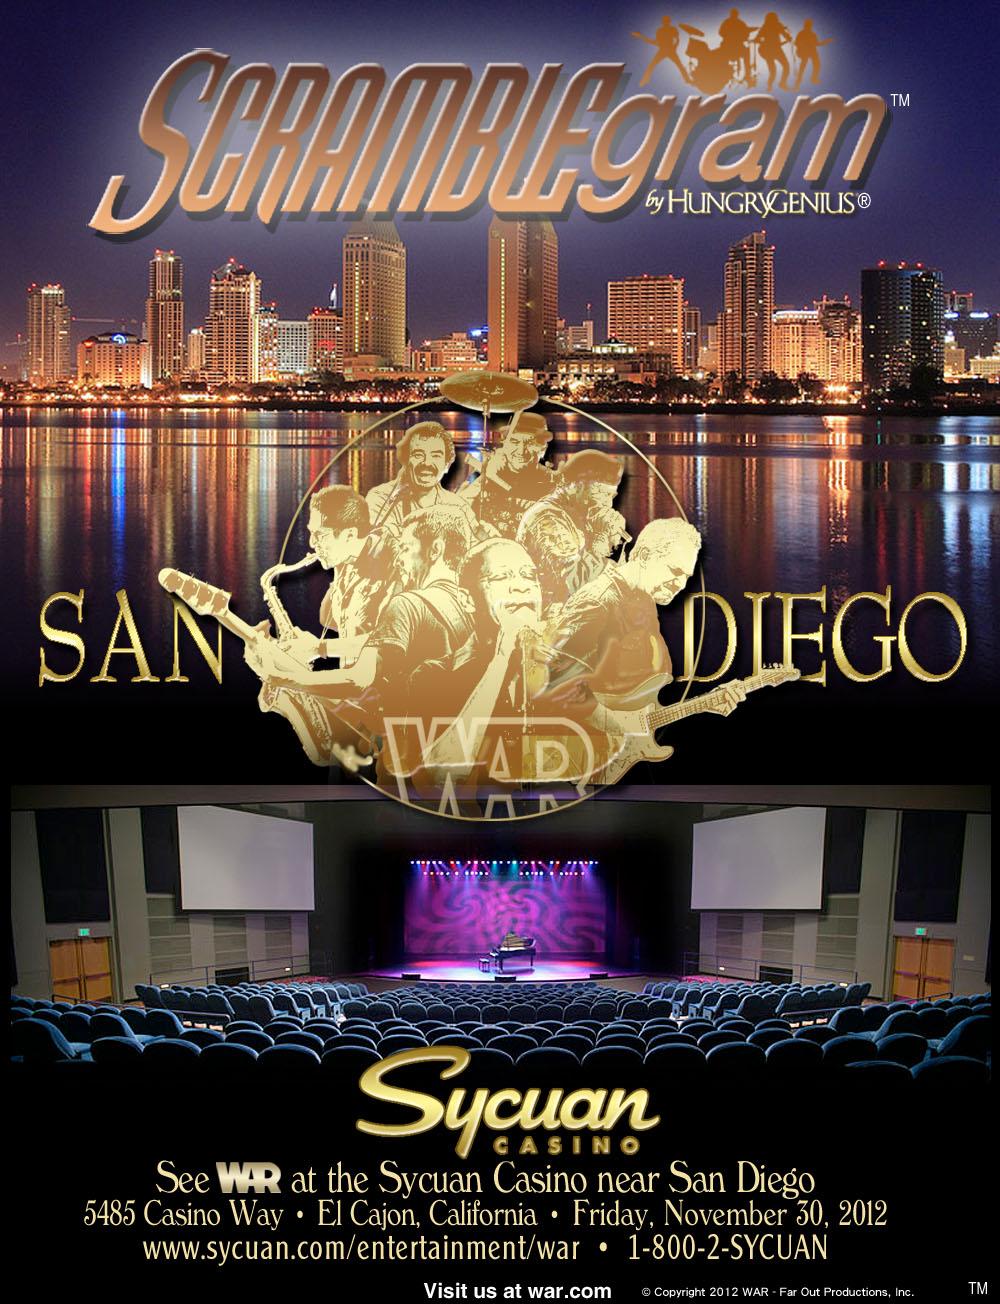 San Diego Casino Scramblegram.jpg